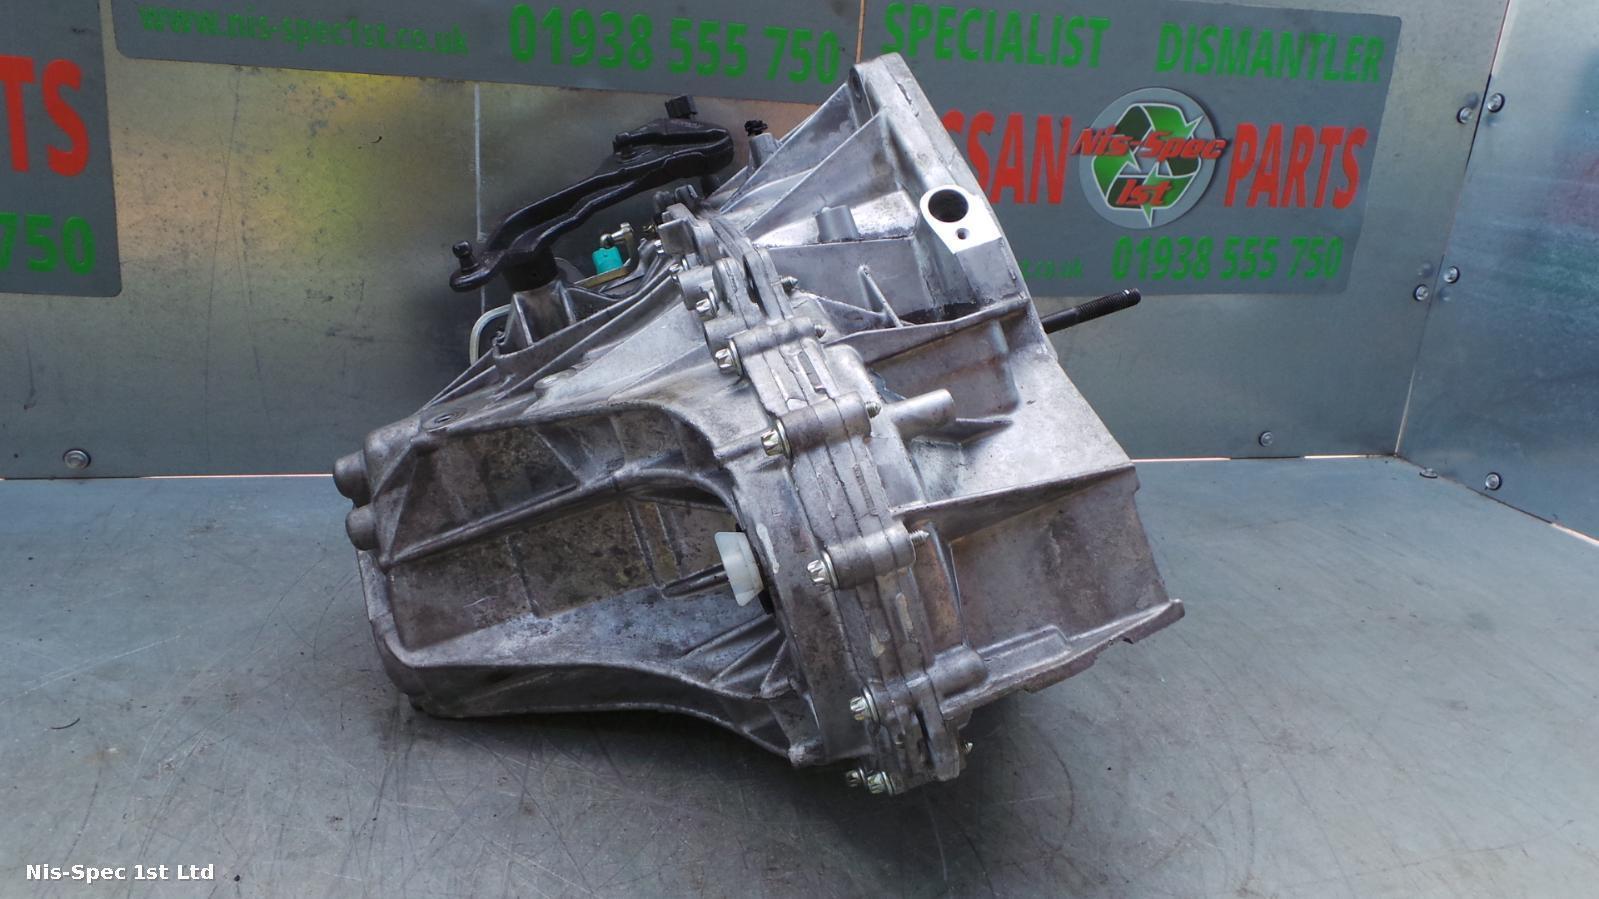 NISSAN QASHQAI J11 1.2 PETROL 13-17 6 SPEED MANUAL GEARBOX 12 MONTH WARRANTY